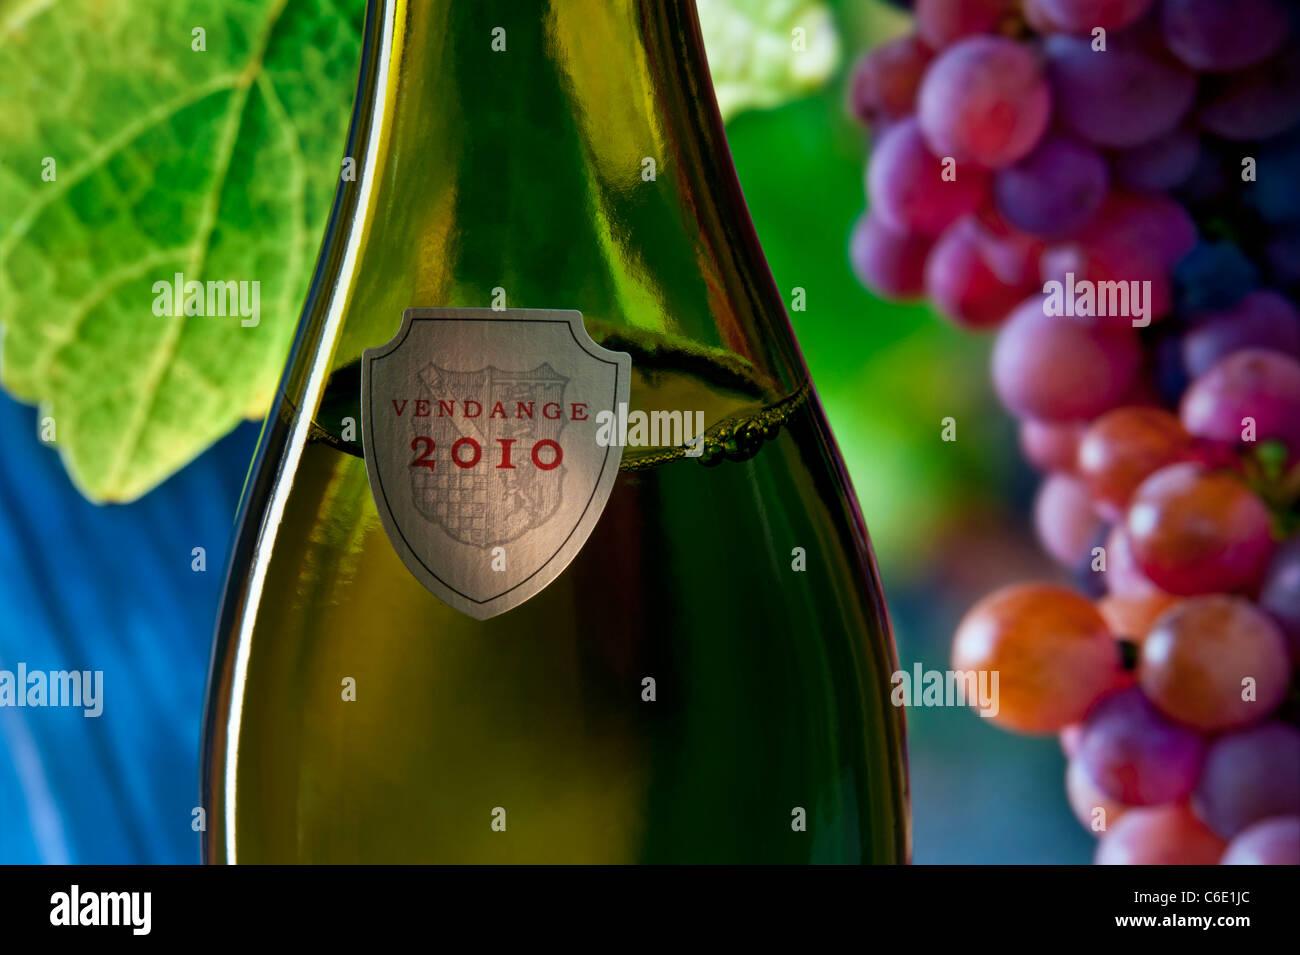 'Vendange 2010' (2010 grape harvest) label on bottle of wine with ripe grapes on vine in background France - Stock Image